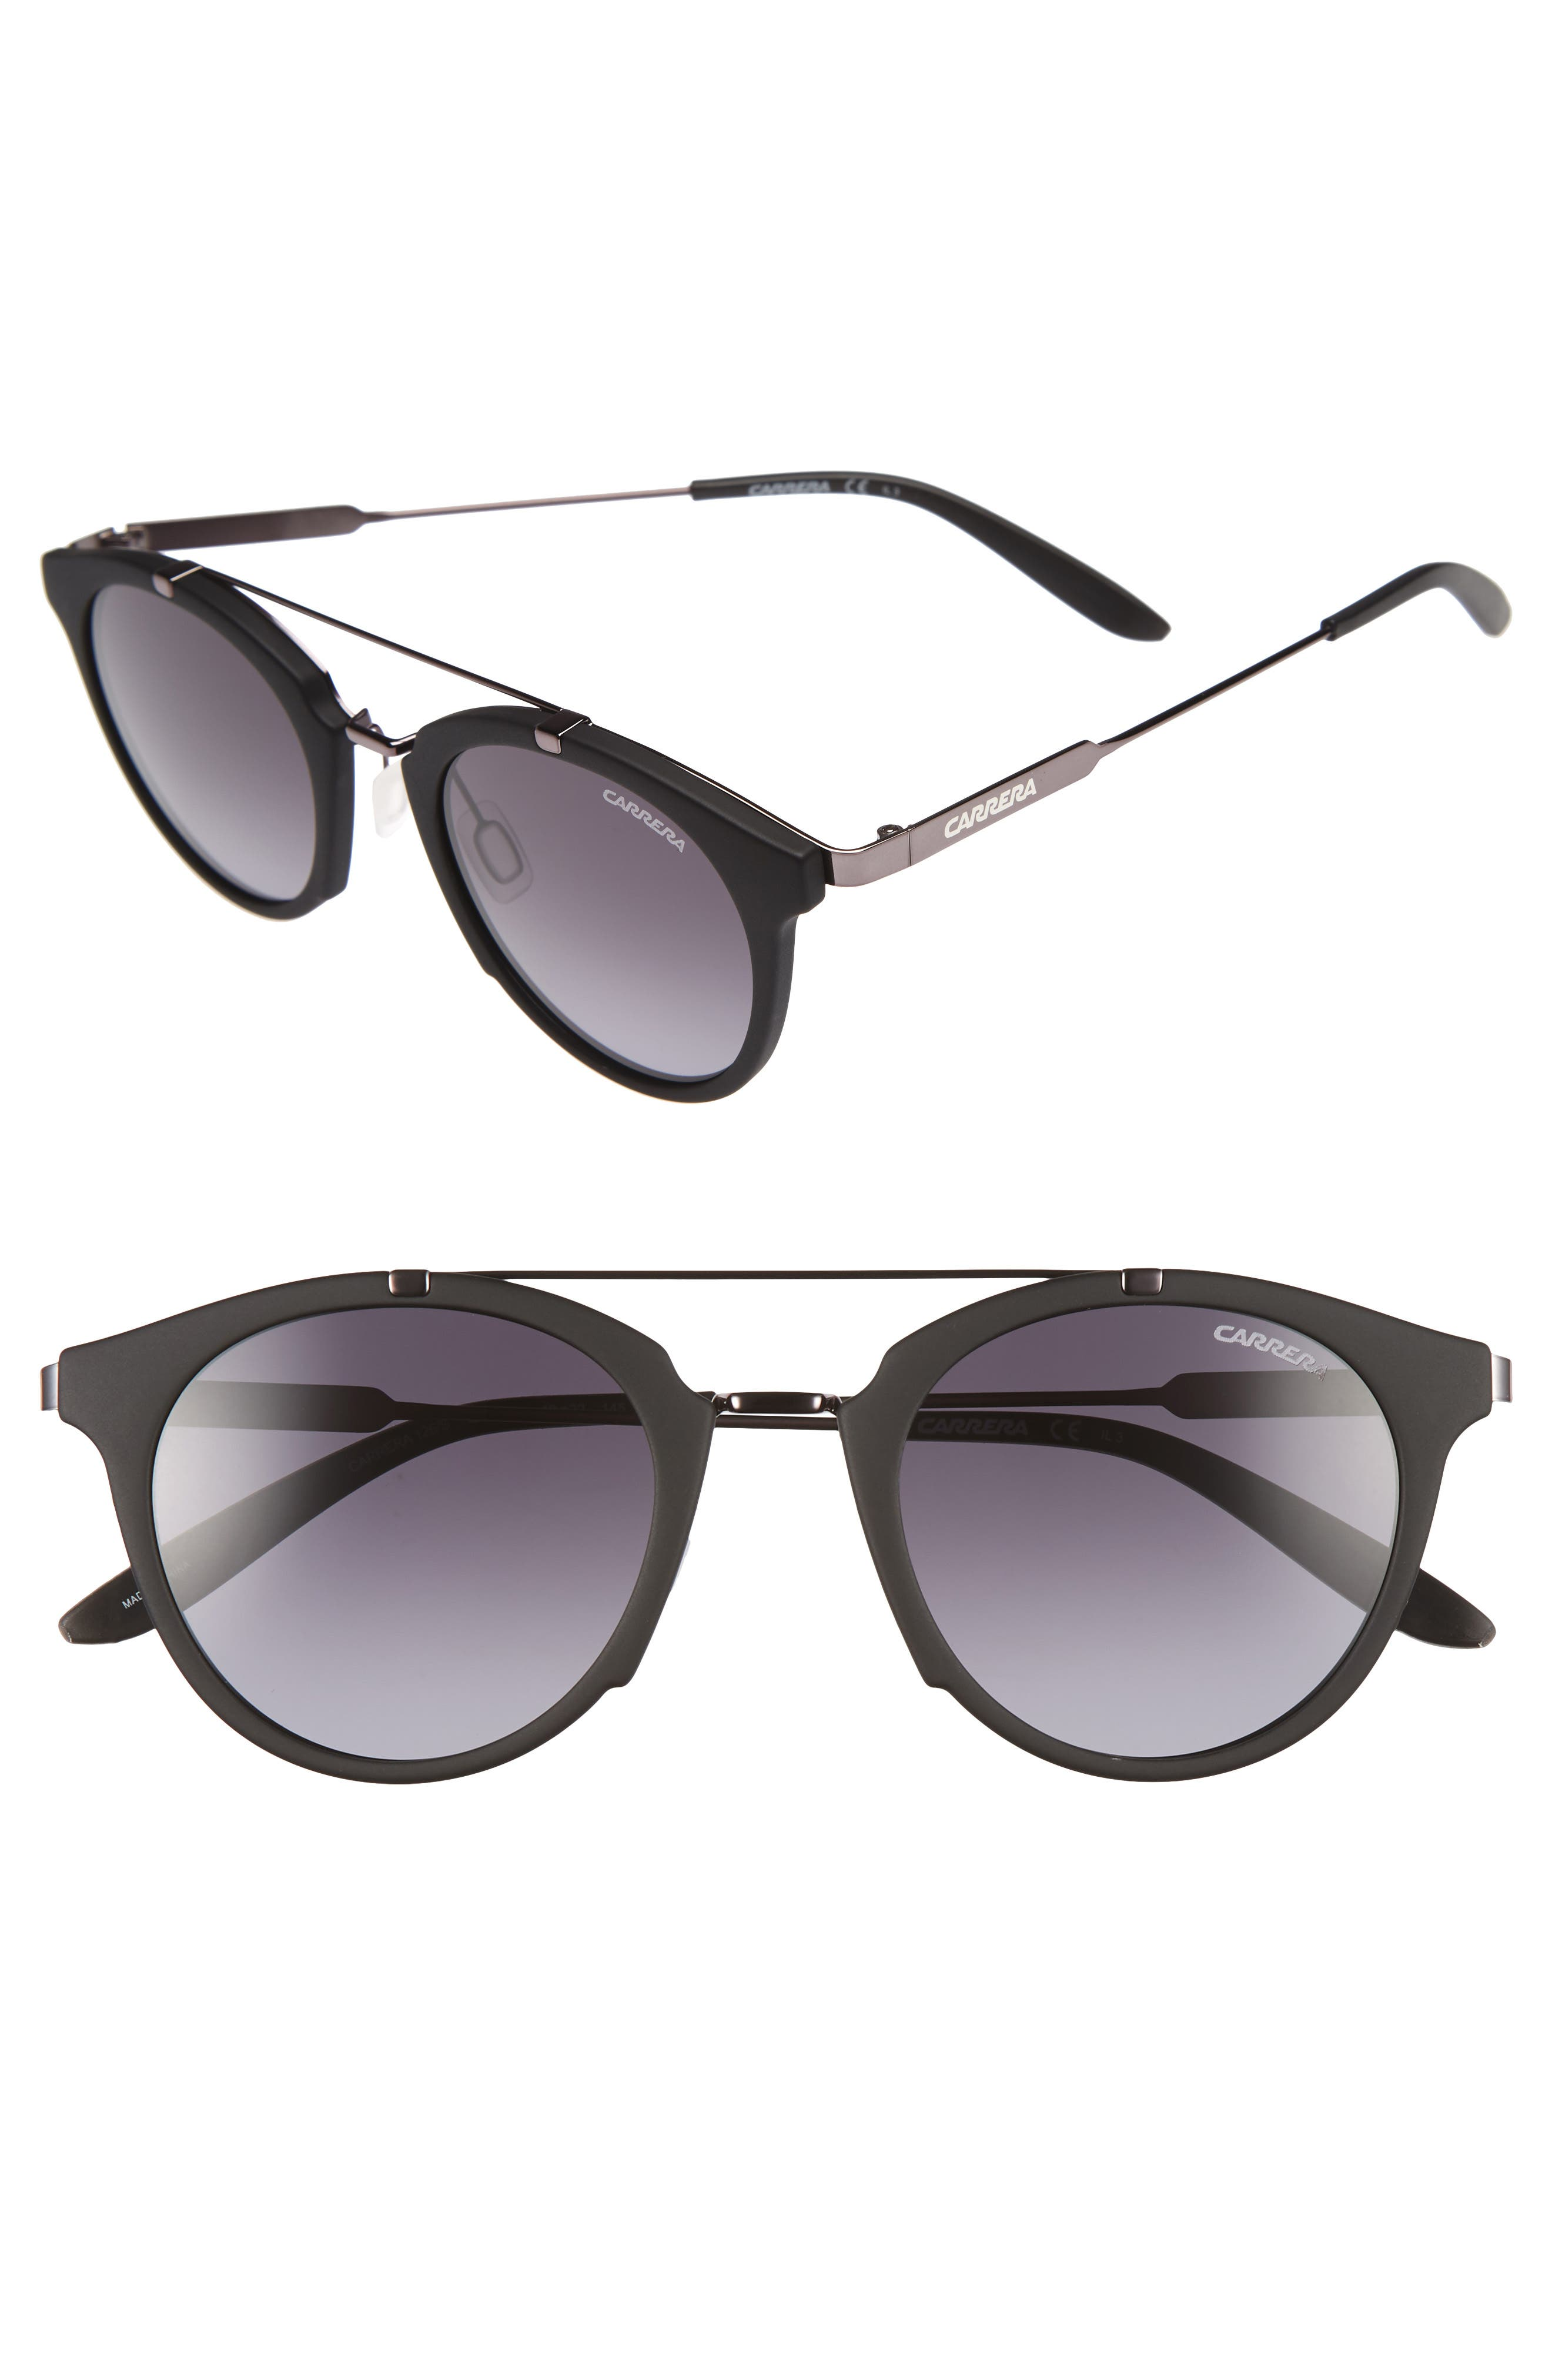 Carrera Eyewear Retro 49mm Sunglasses